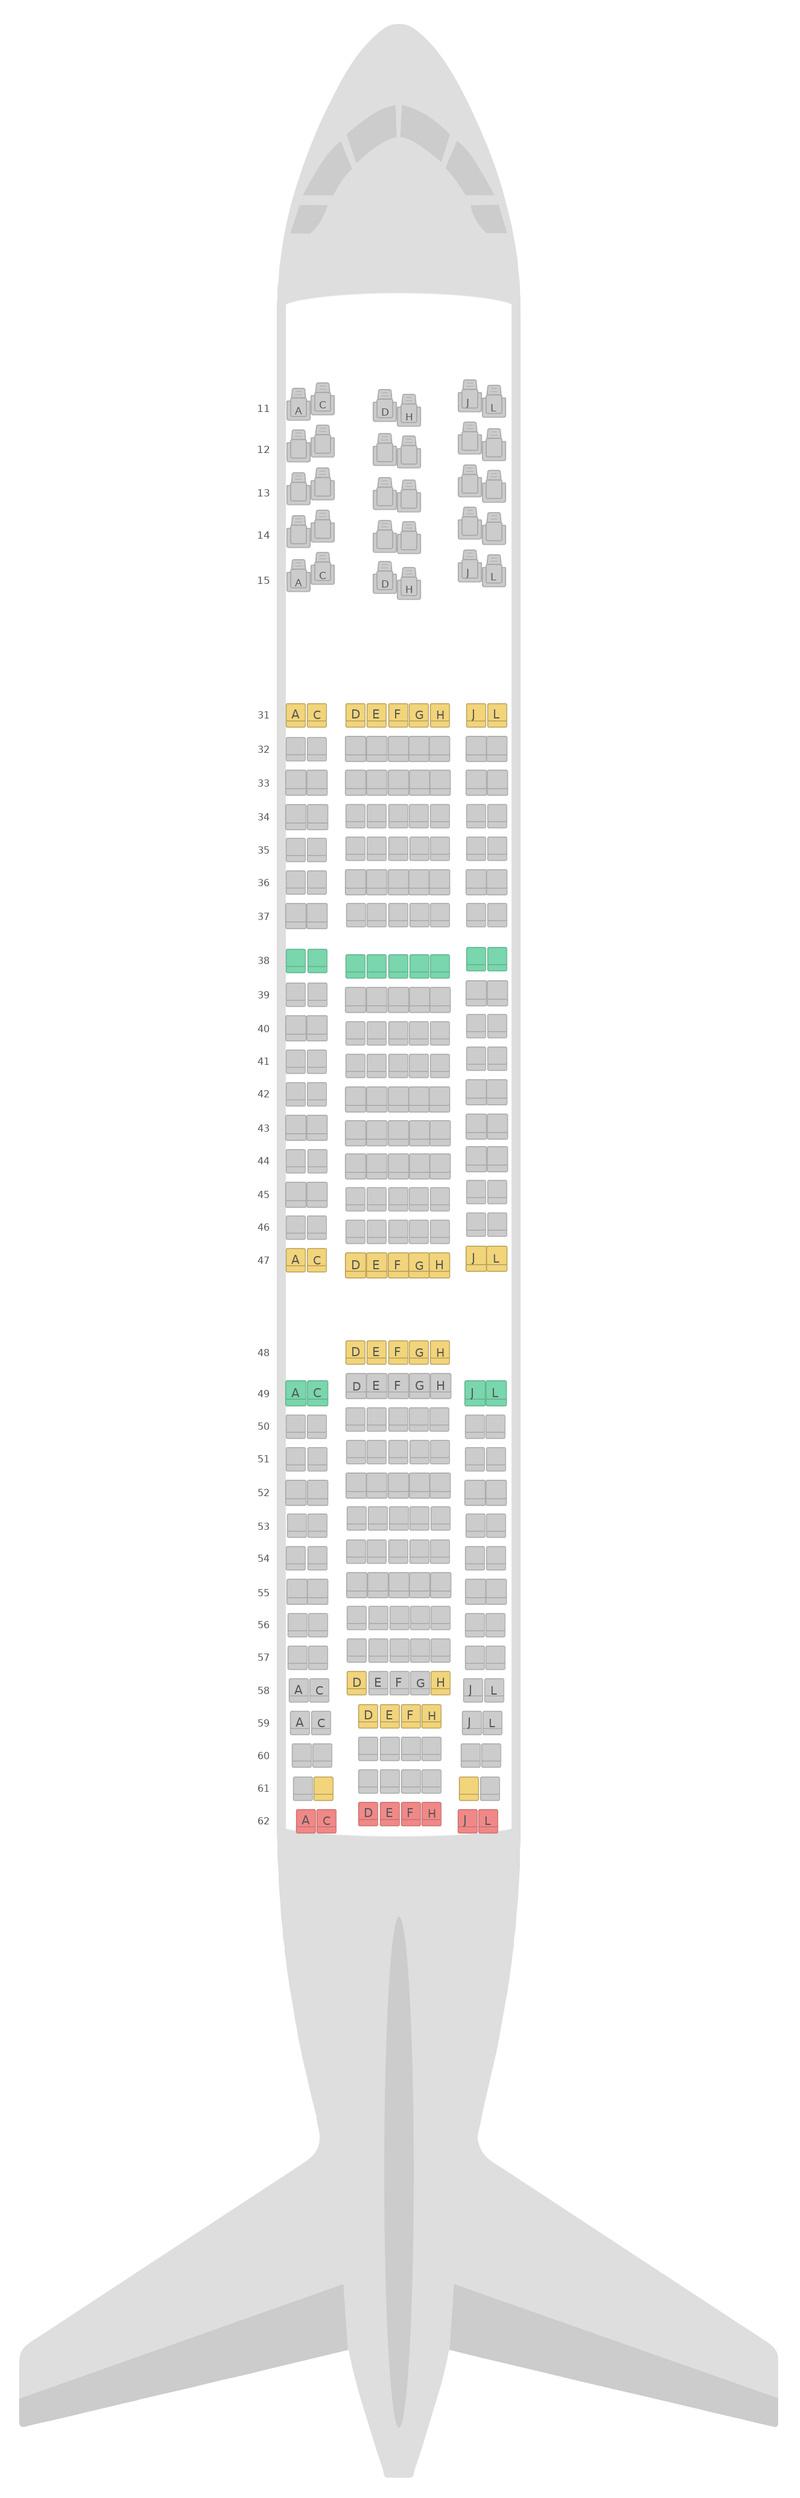 Схема салона Боинг 777-200 (777) Эйр Чайна